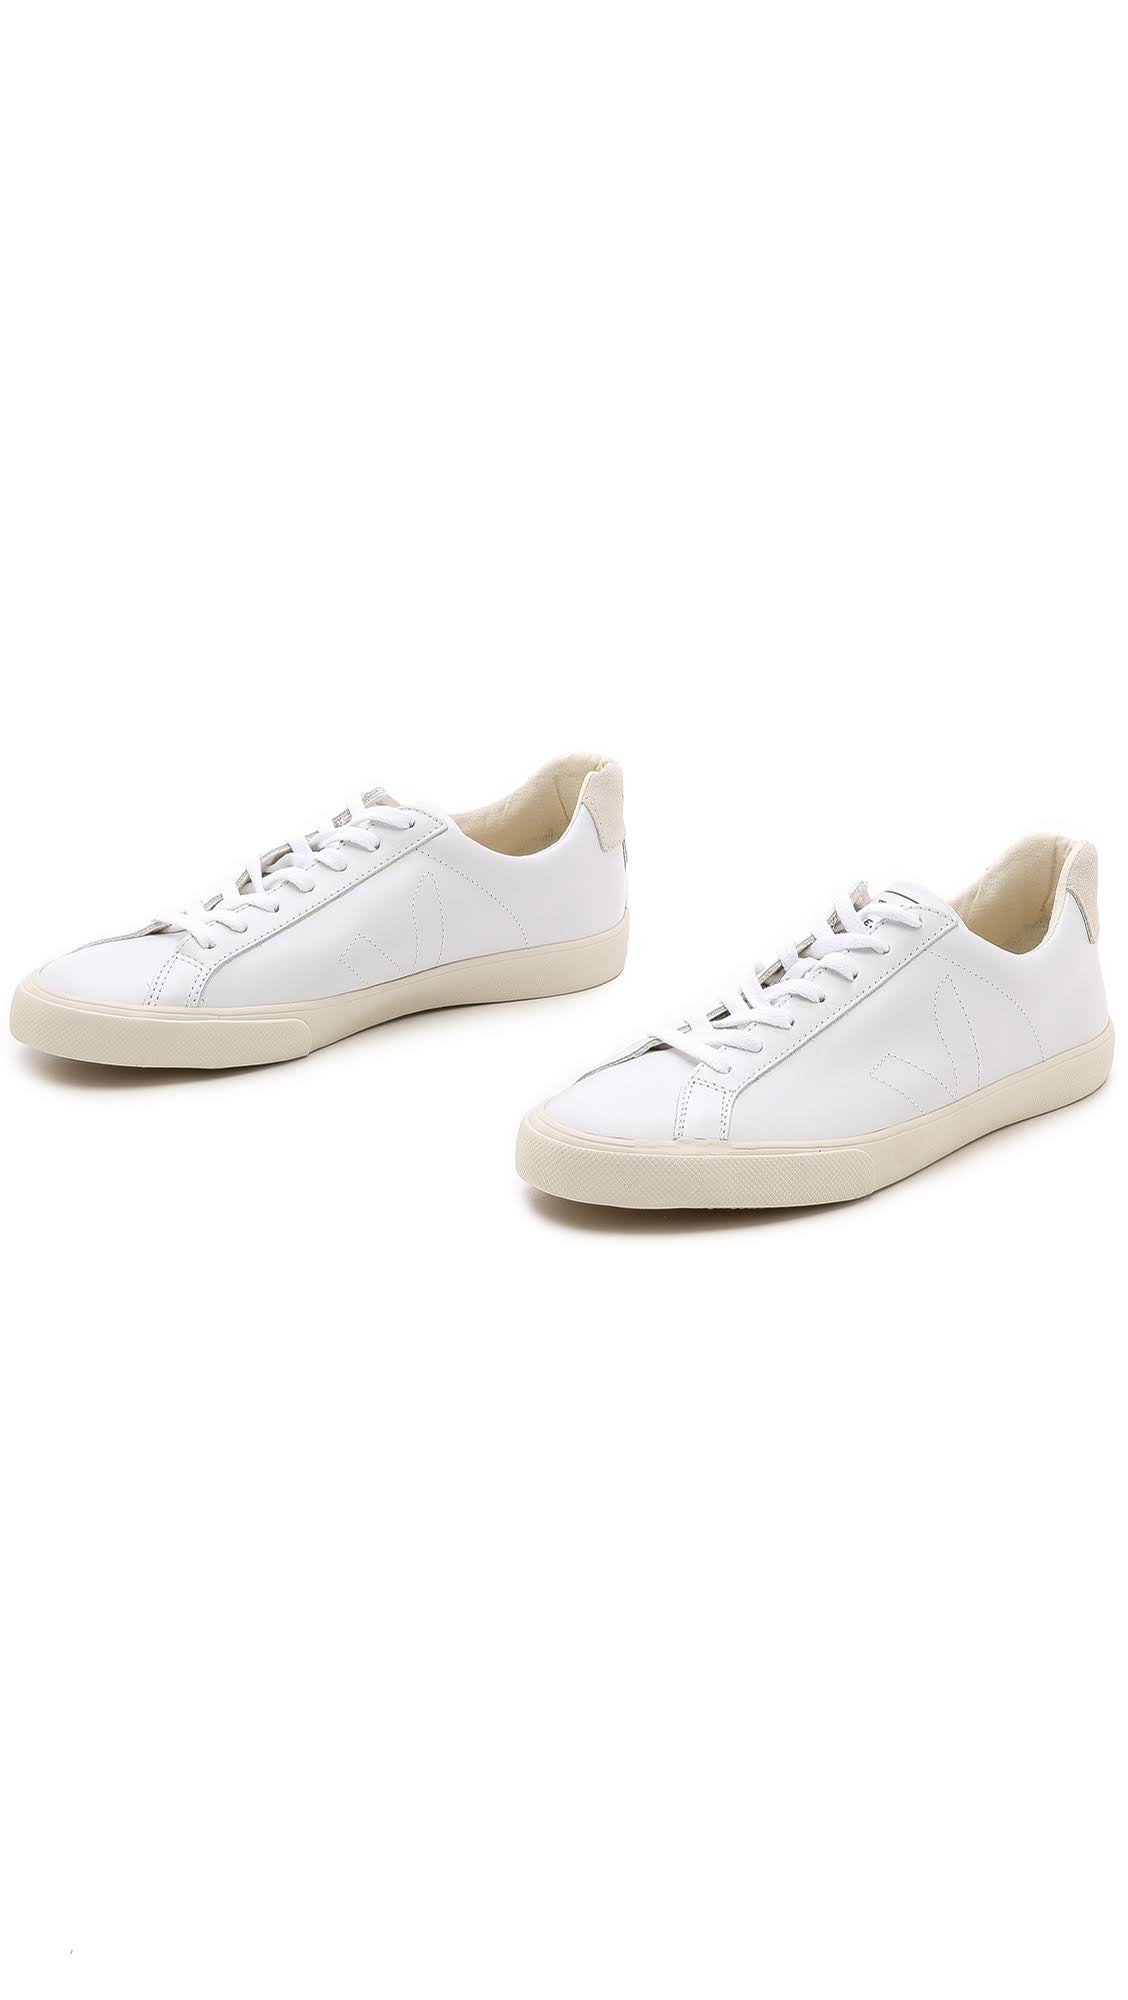 Zie Extra Baskets Zie Extra Esplar White White Zie Esplar Baskets q3cARjL54